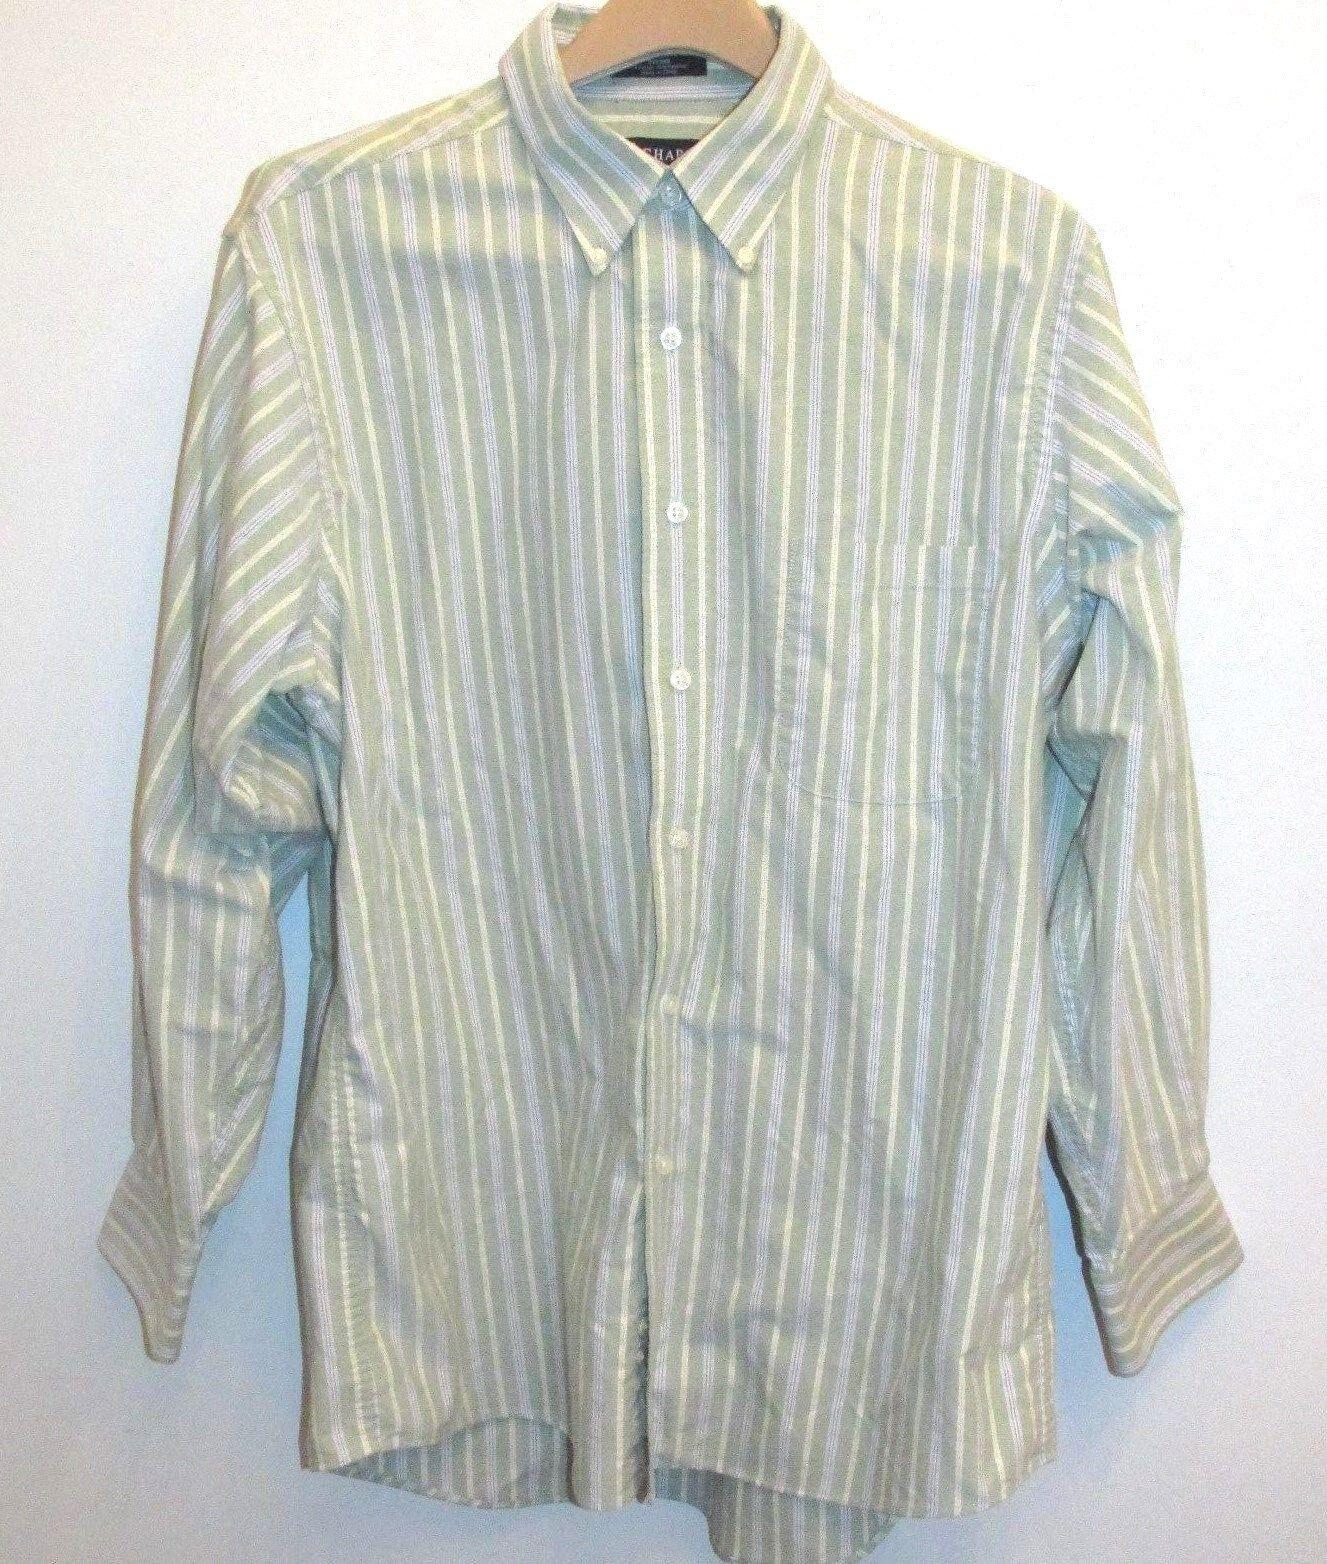 3a4c29a1203995 Chaps Mens Oxford Shirt Wrinkle Free Green Yellow Striped Button Down 16 16  1 2